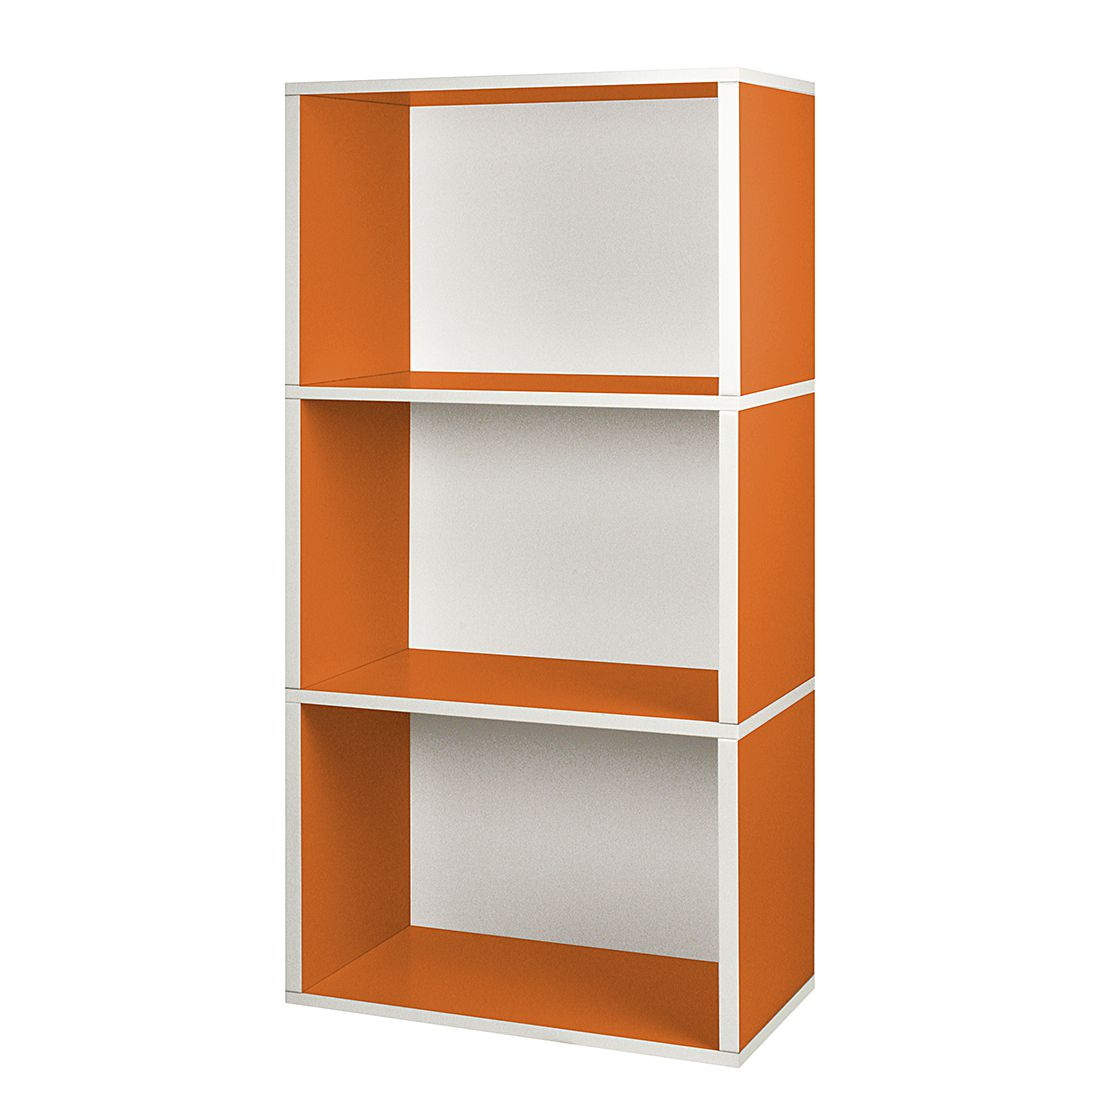 Modulares Schranksystem Rectangle Plus 3 Orange, waybasics günstig